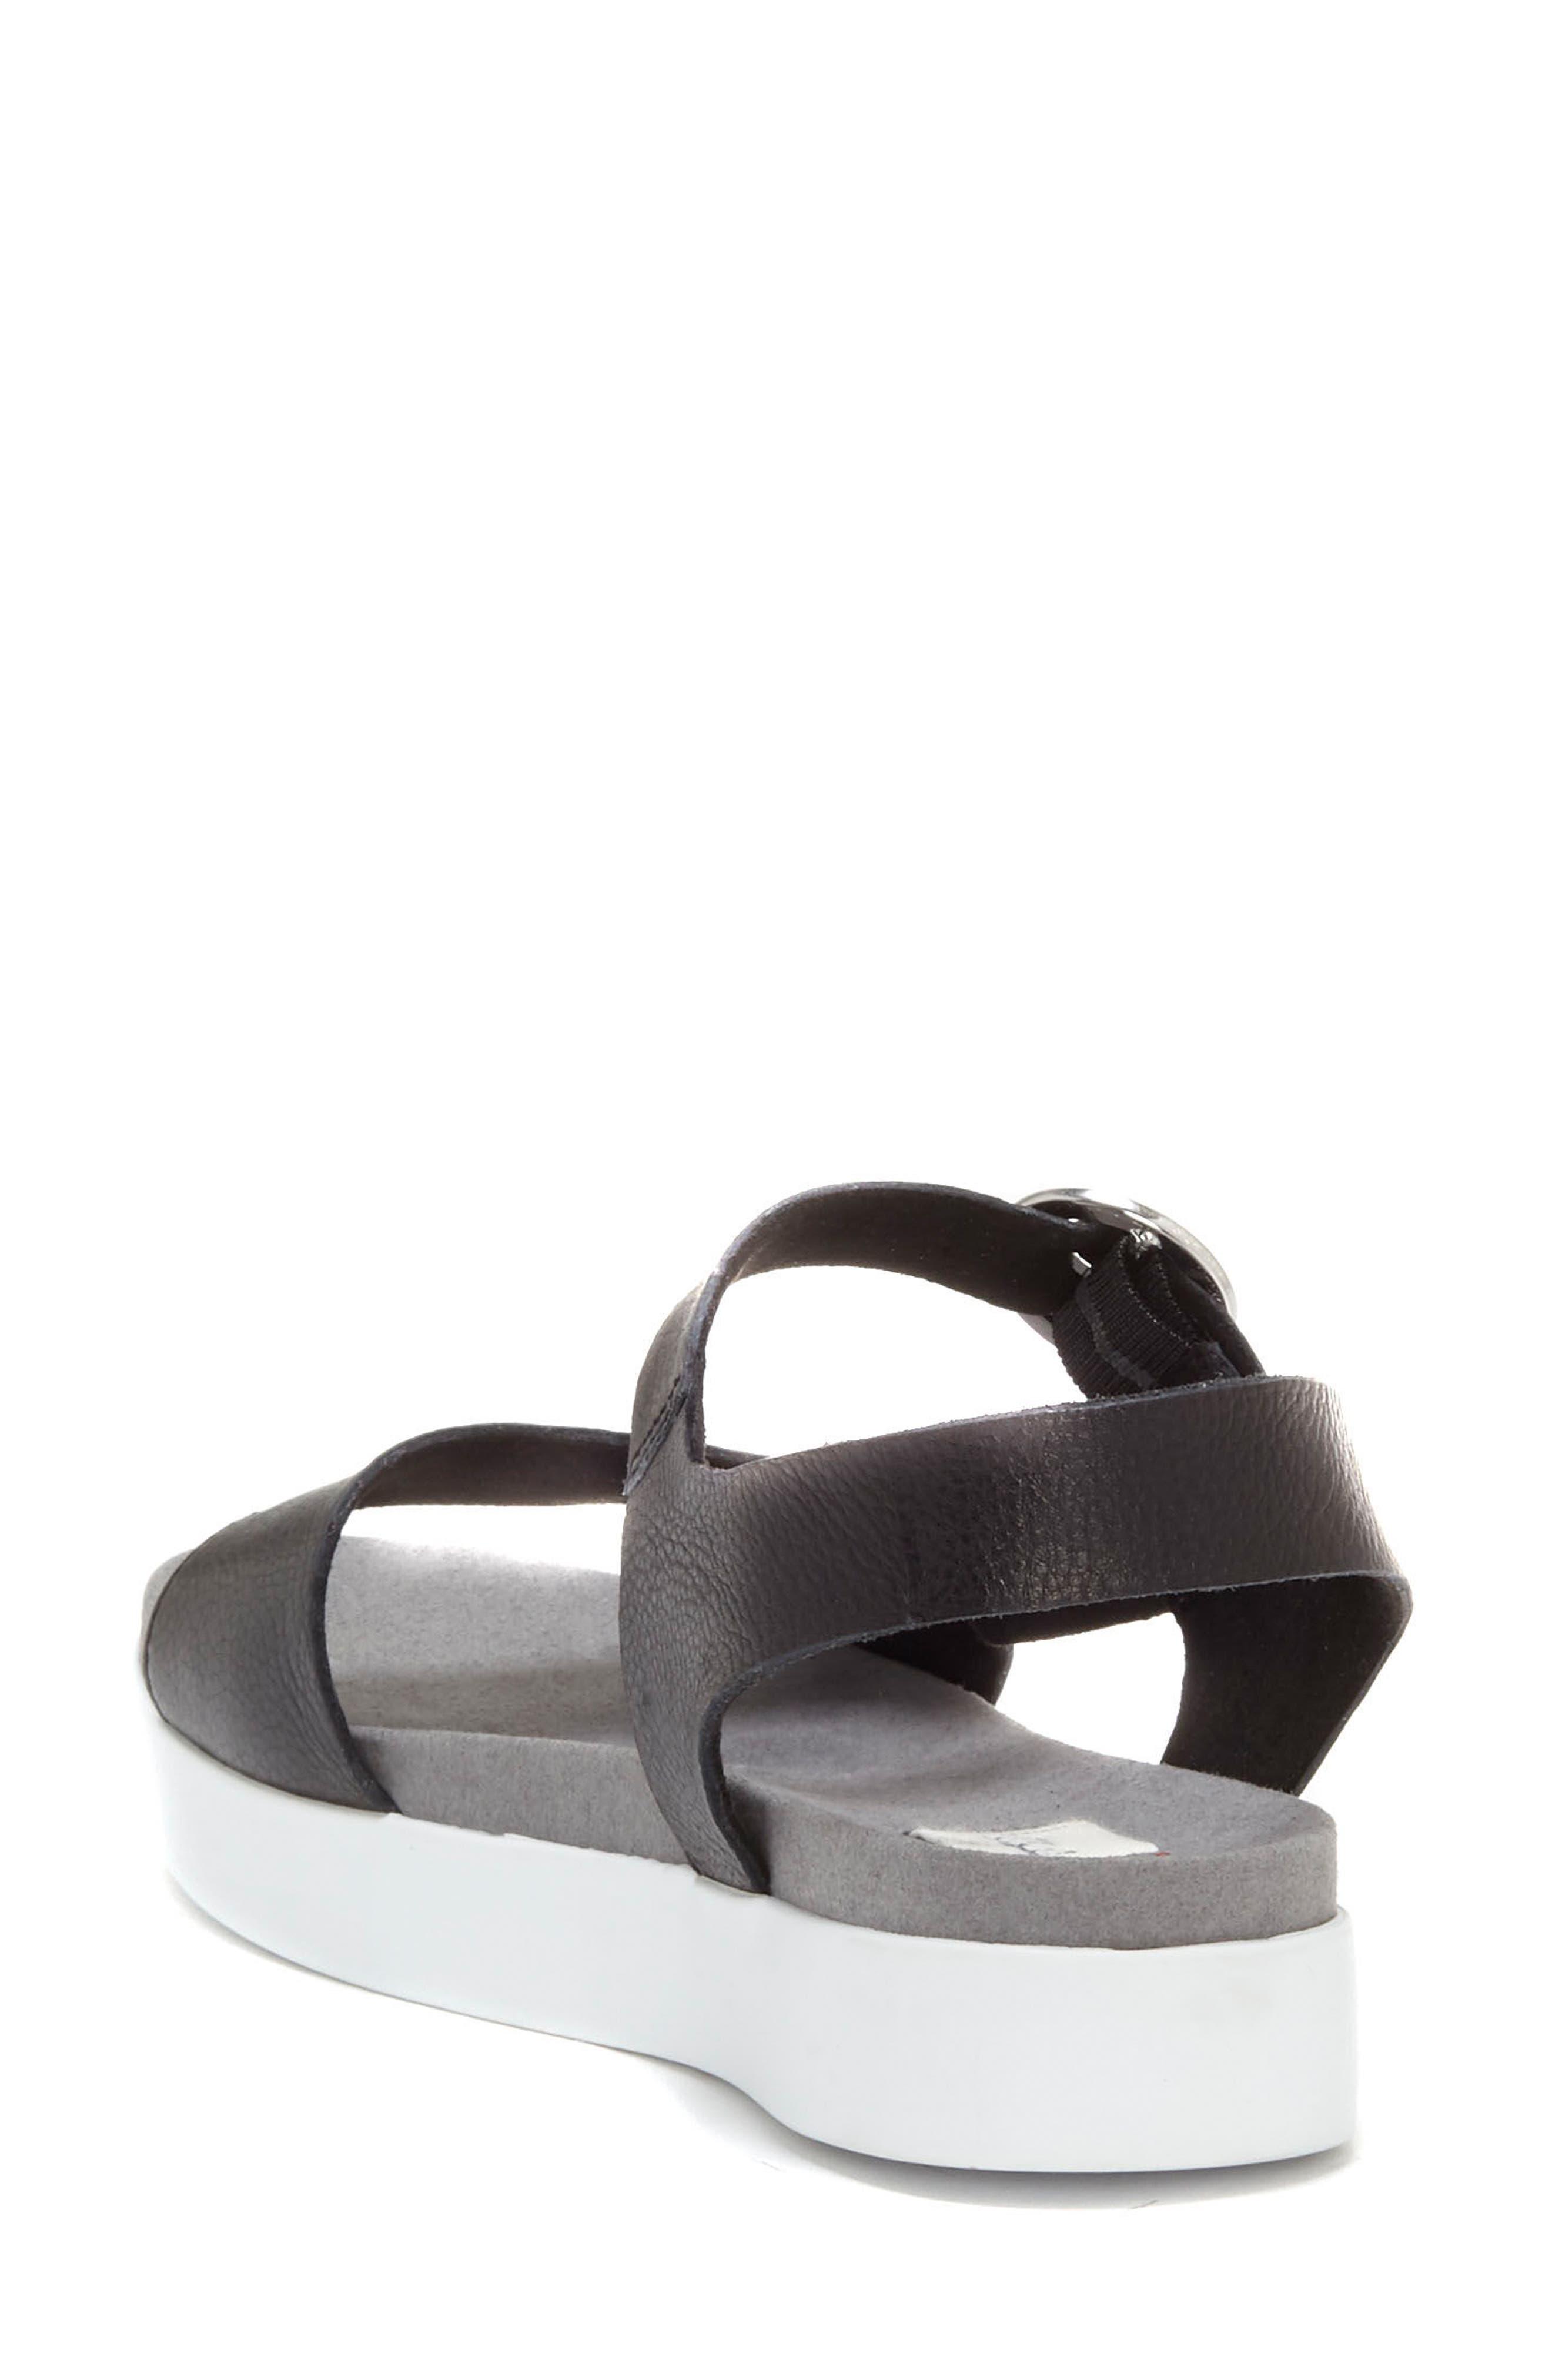 Caspin Sandal,                             Alternate thumbnail 2, color,                             Black Leather